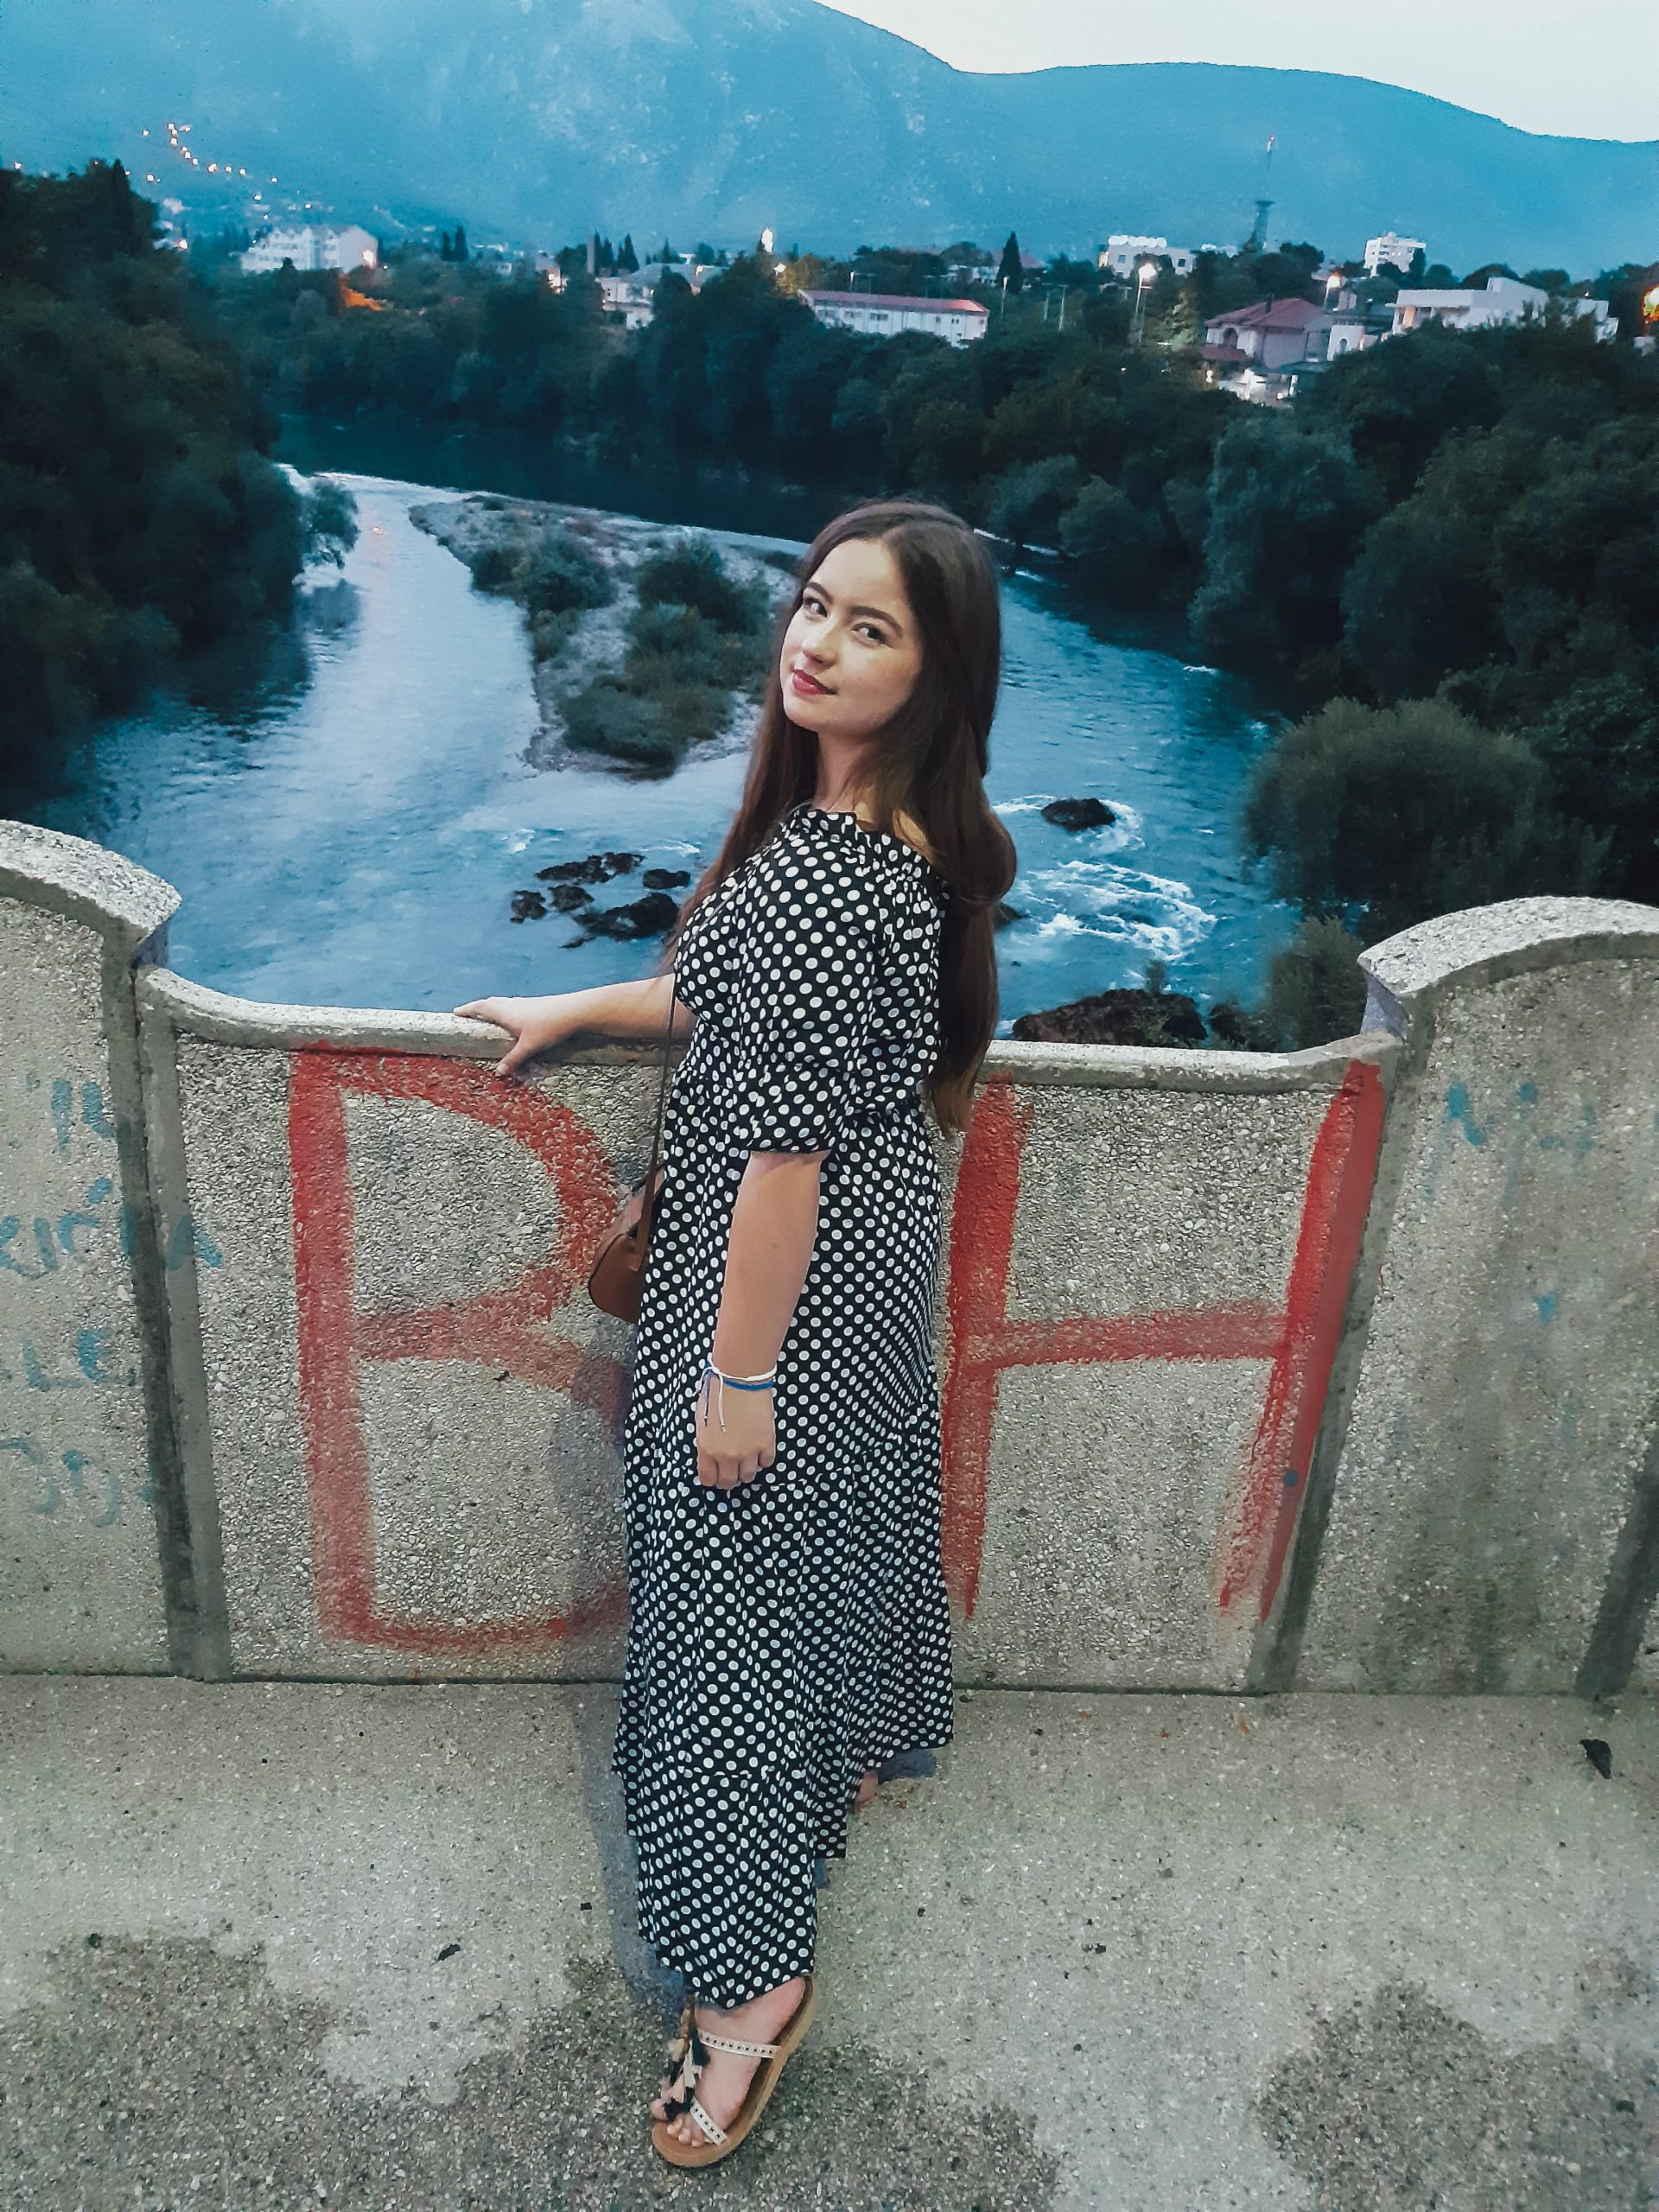 polka dot dress outfit livinglikev fashion blogger style blogger living like v vildana šuta vildana livinglikev